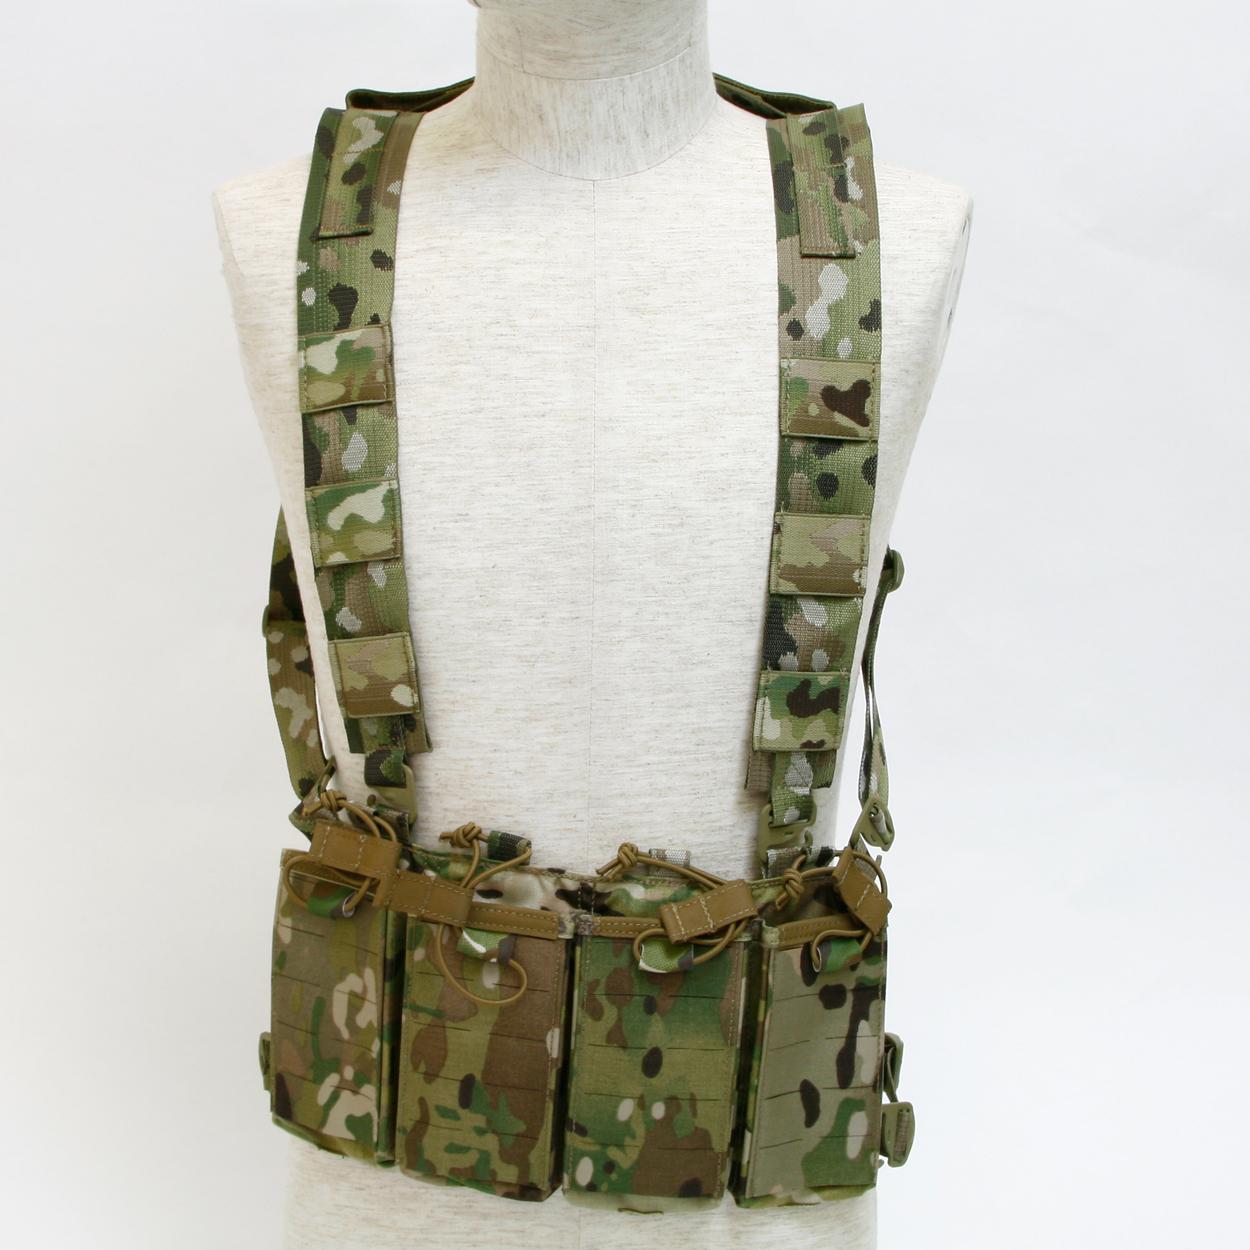 M4/AK Chest Rig 6/12 MC